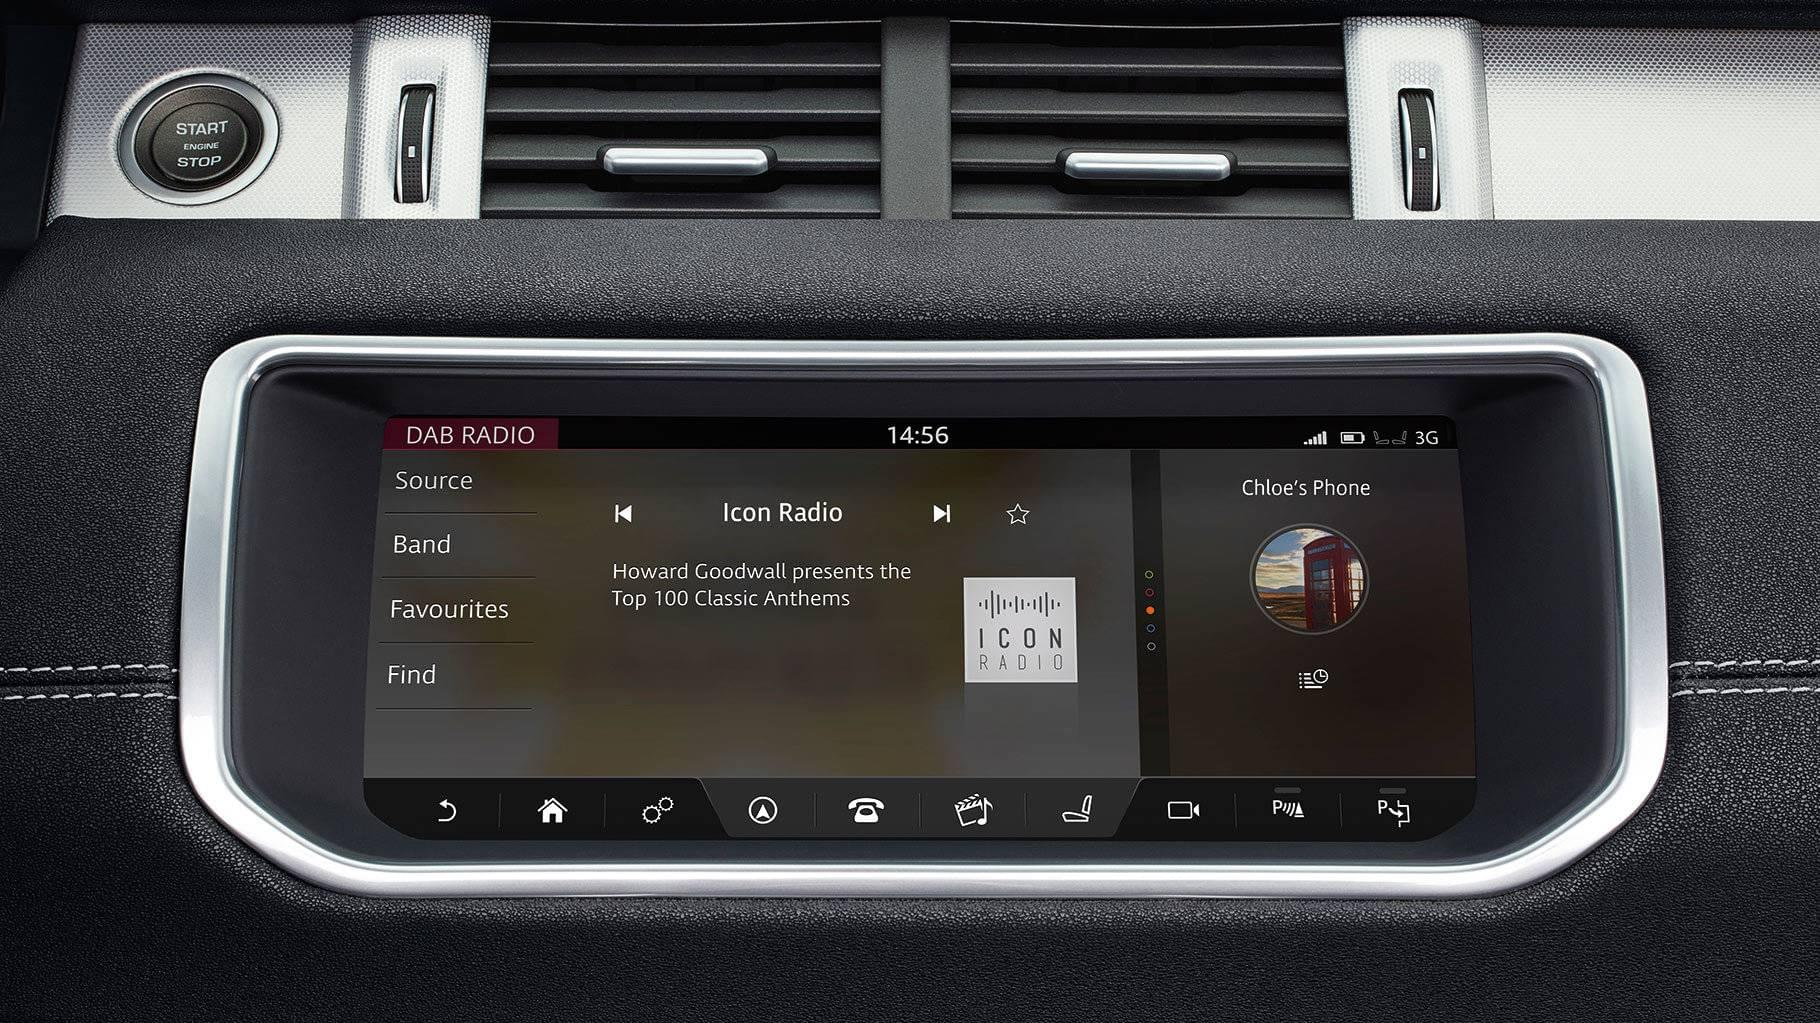 2017 Land Rover Range Rover Evoque Technology Features